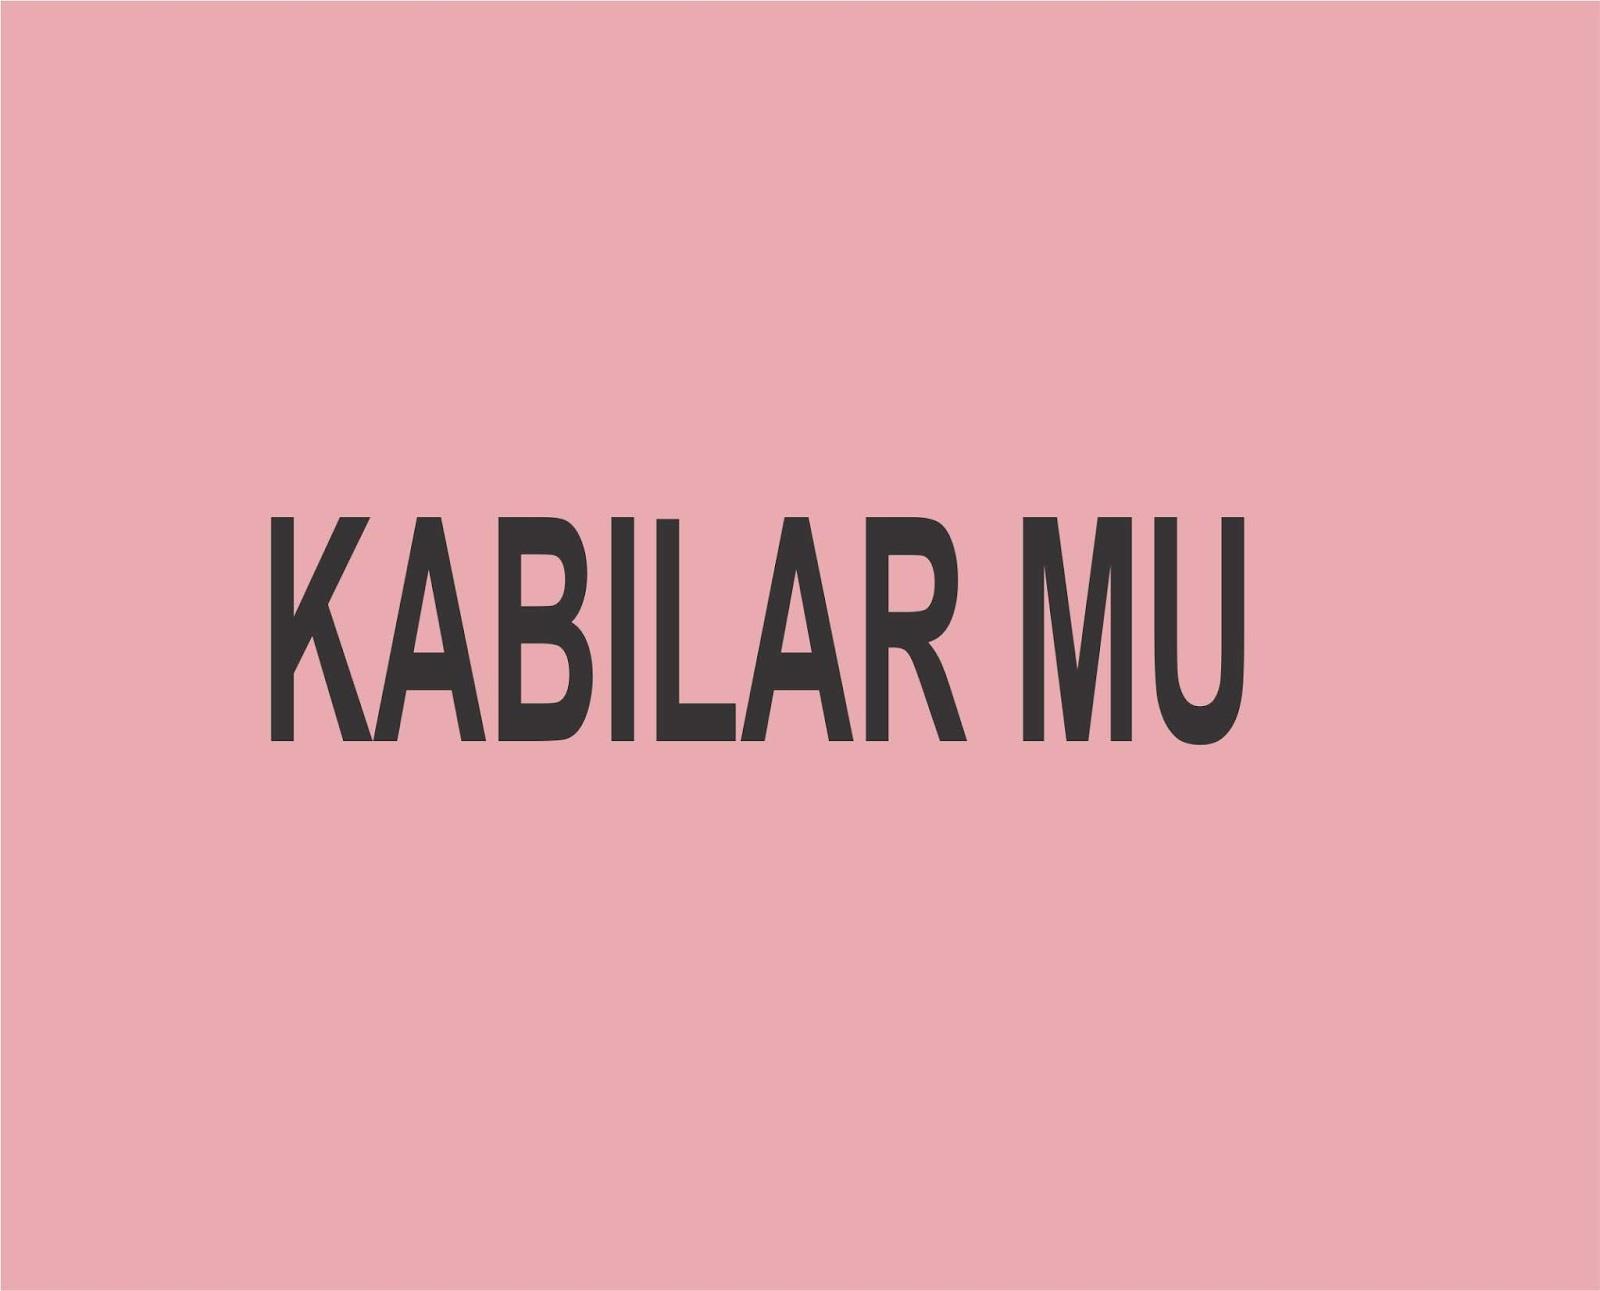 KABILAR MU COMPLETE hausa novel book - Gidan Novels | Hausa